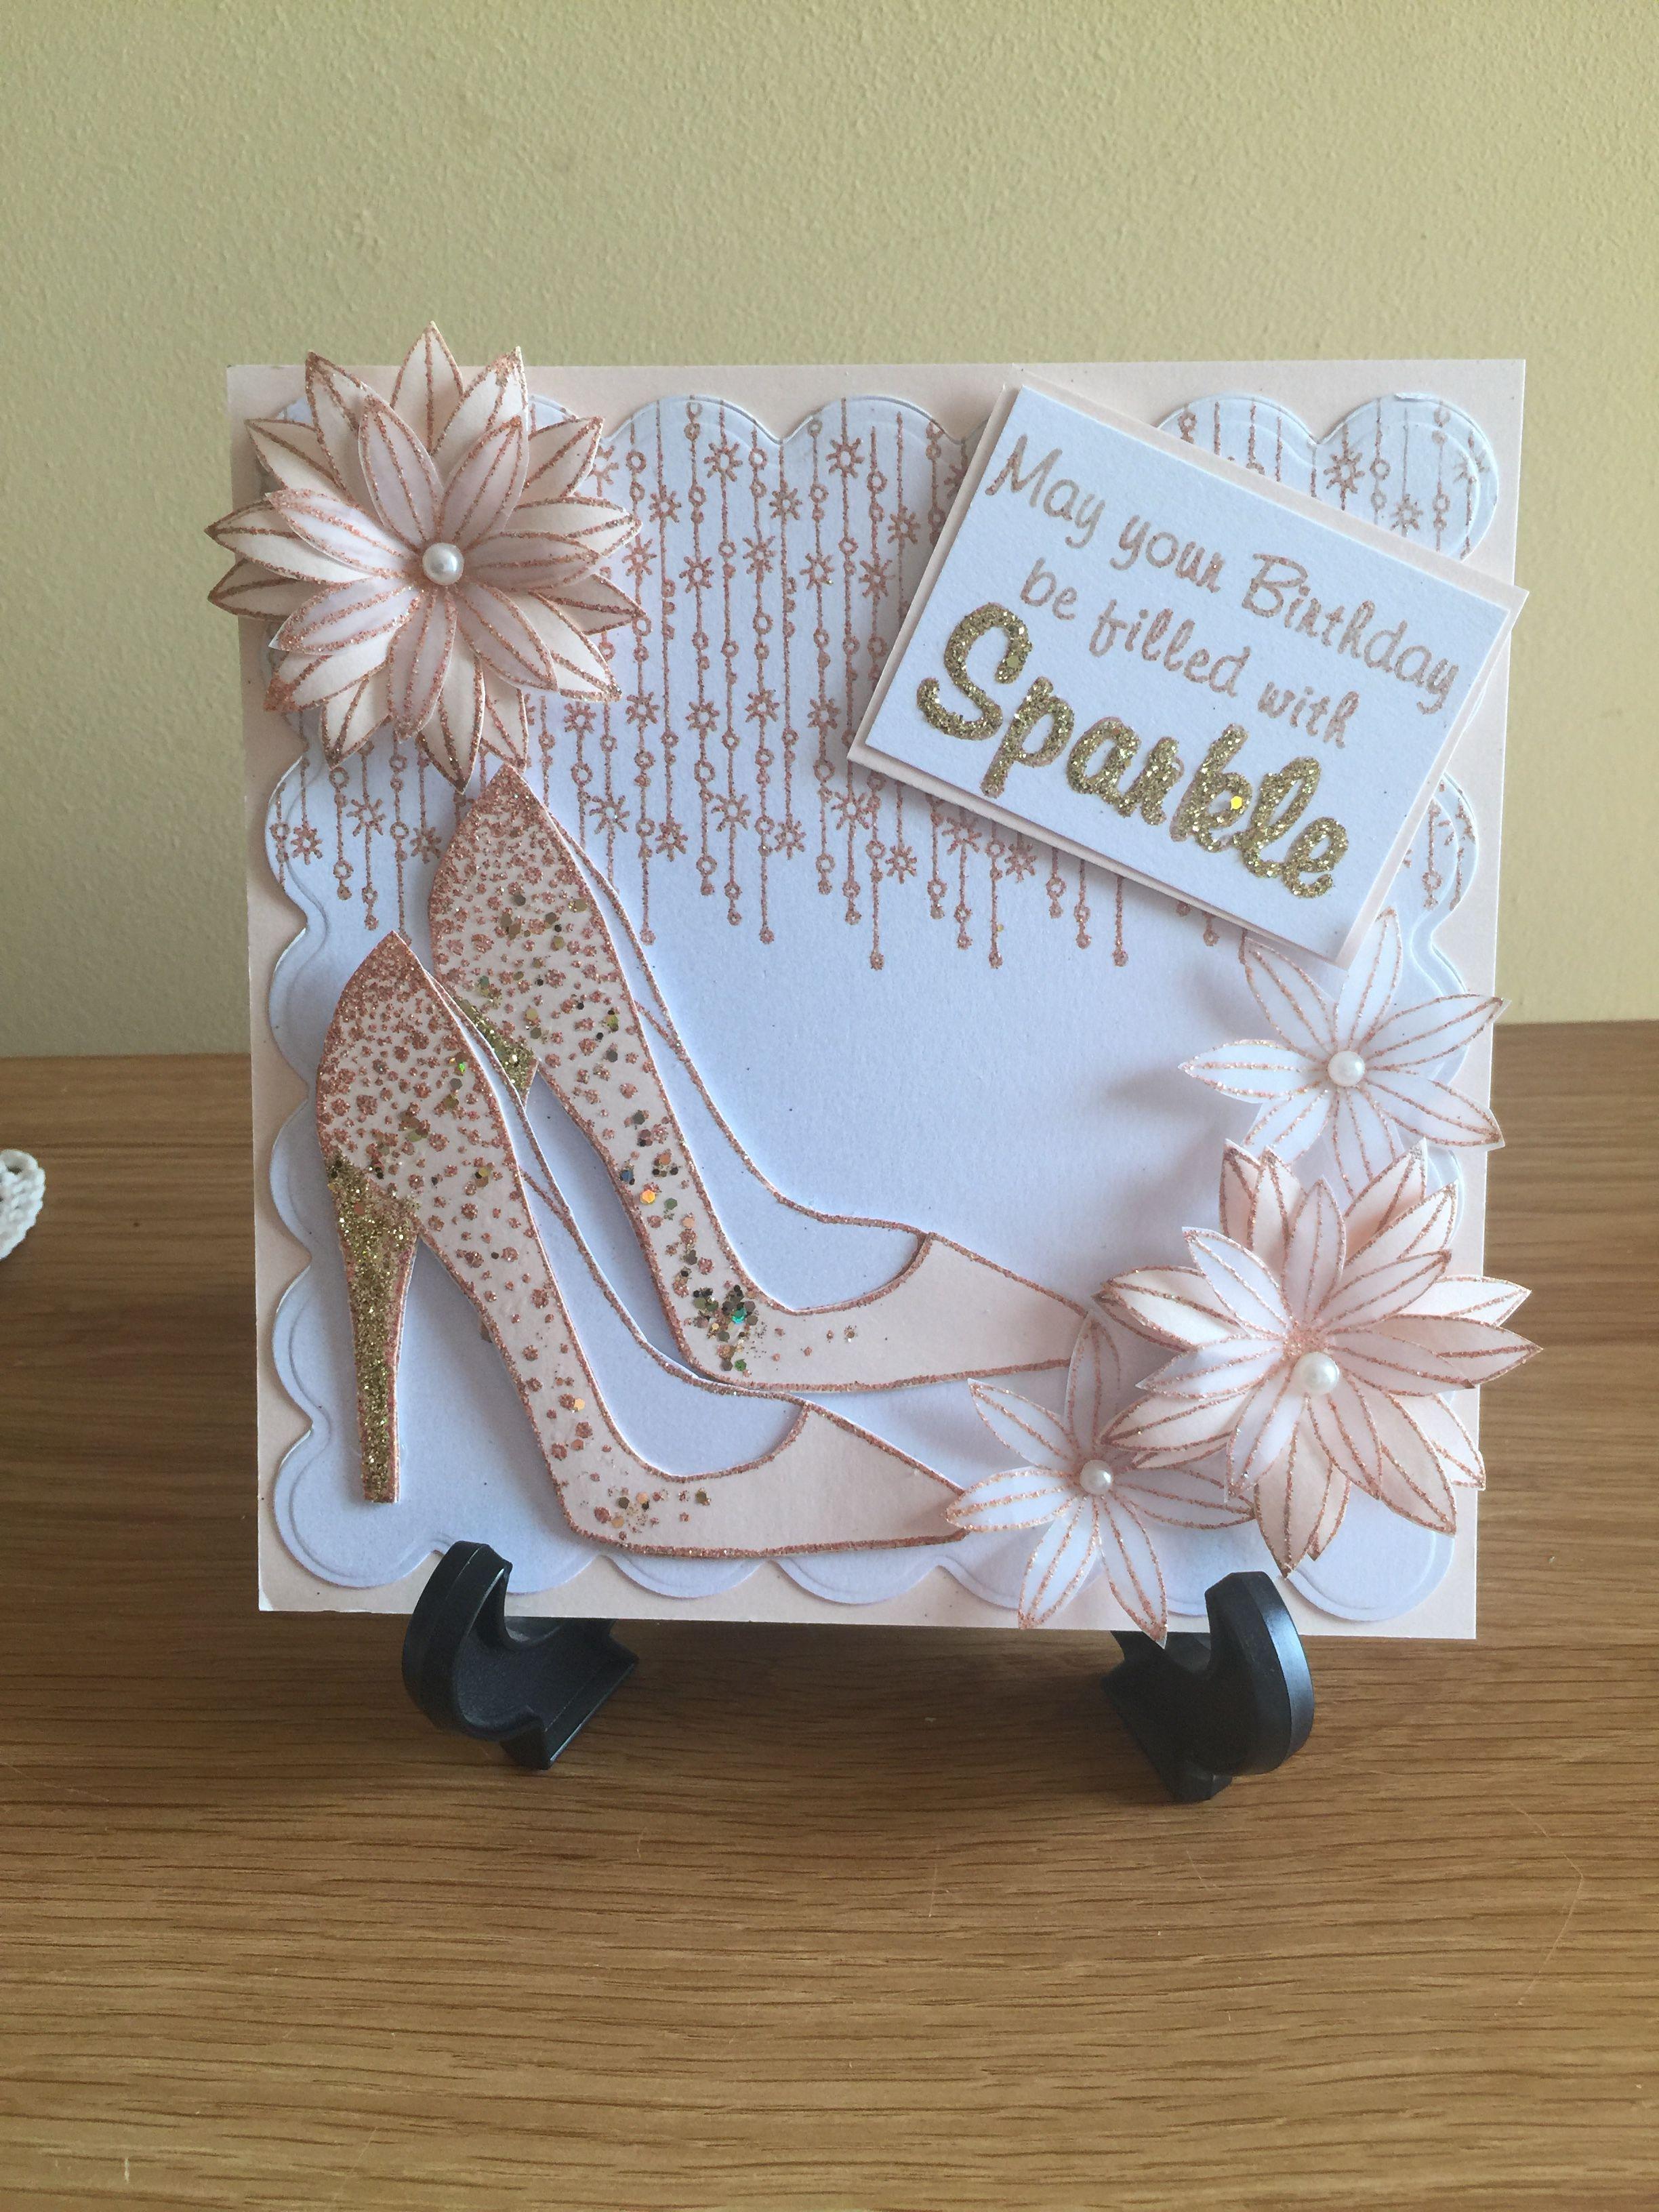 Shoe Birthday Card Birthday Cards For Women Chloes Creative Cards Girl Birthday Cards